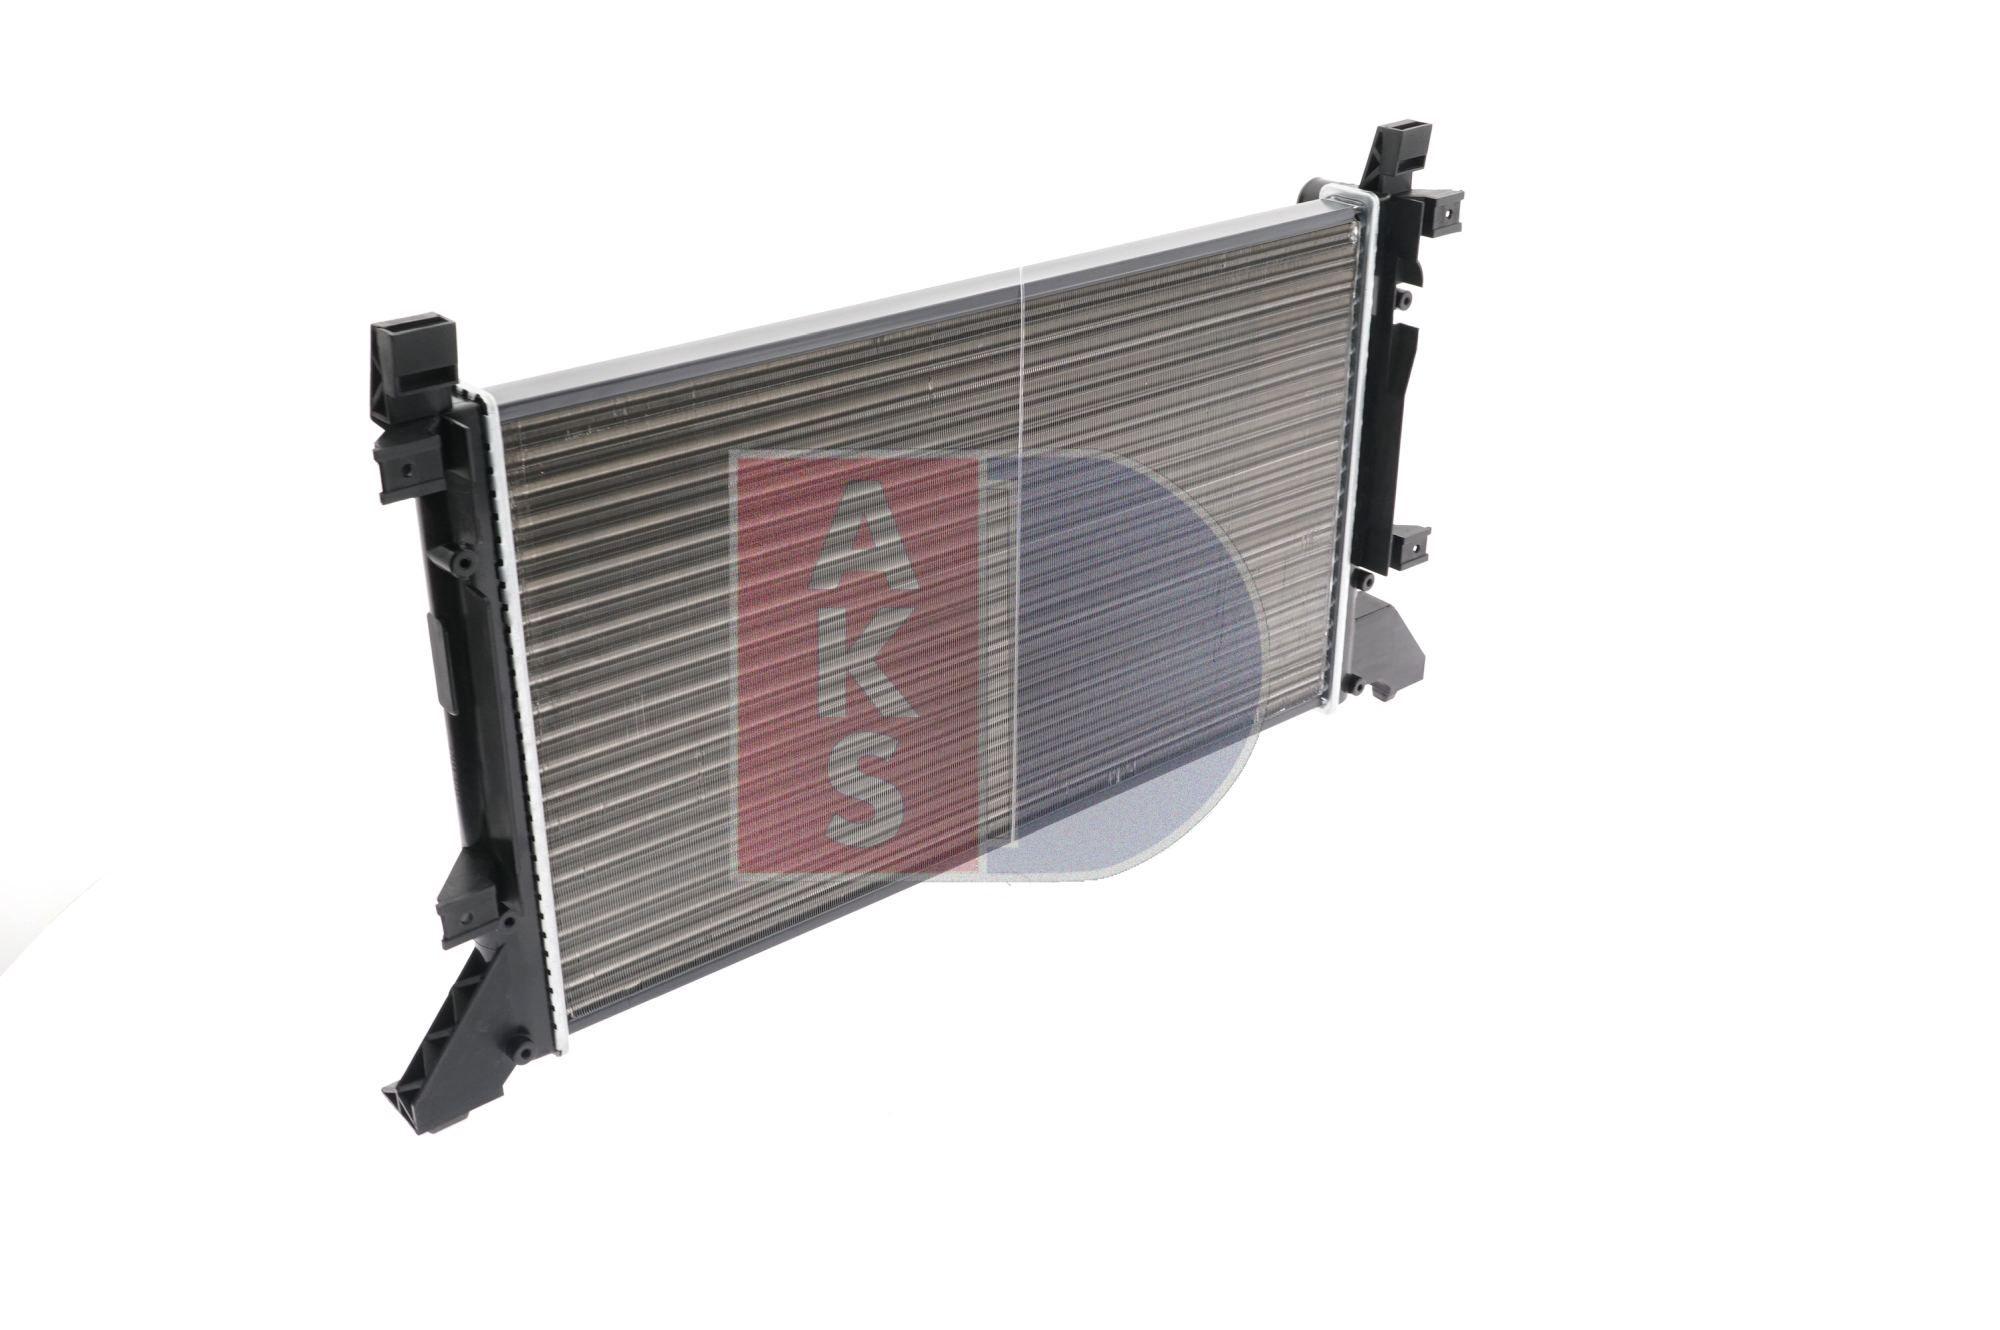 Kühler, Motorkühlung 240070N von AKS DASIS